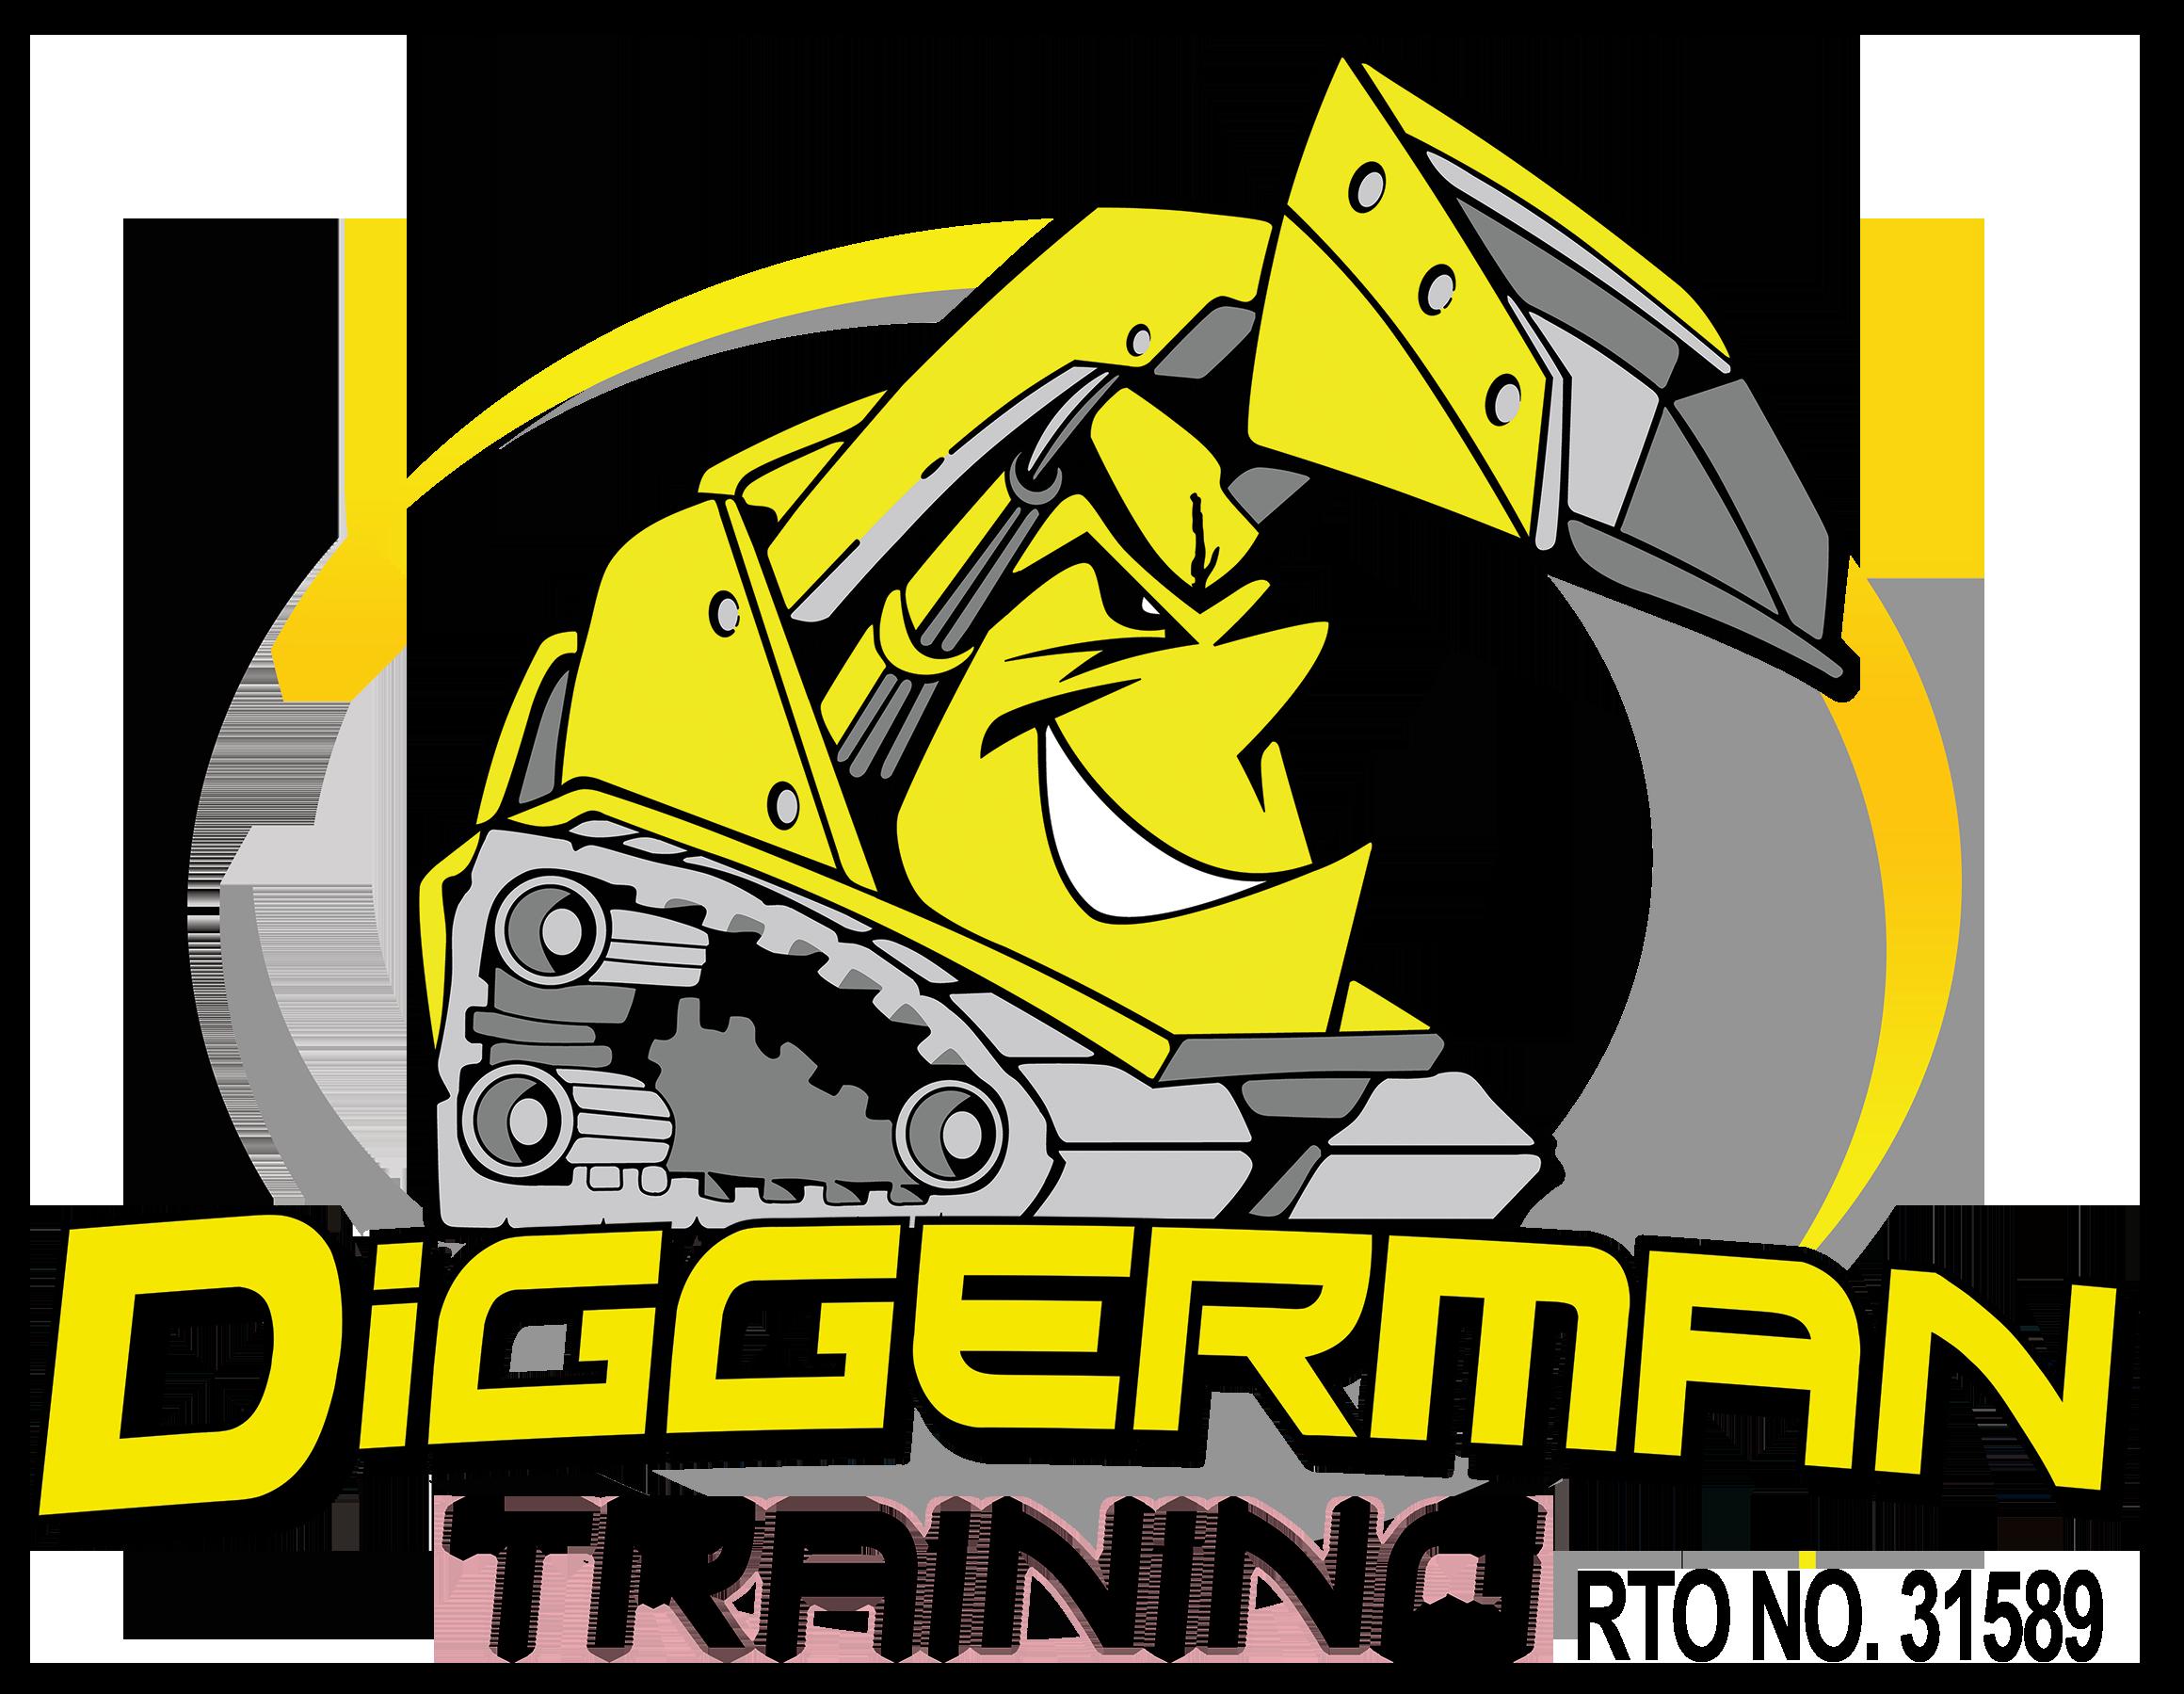 Diggerman Training Logo